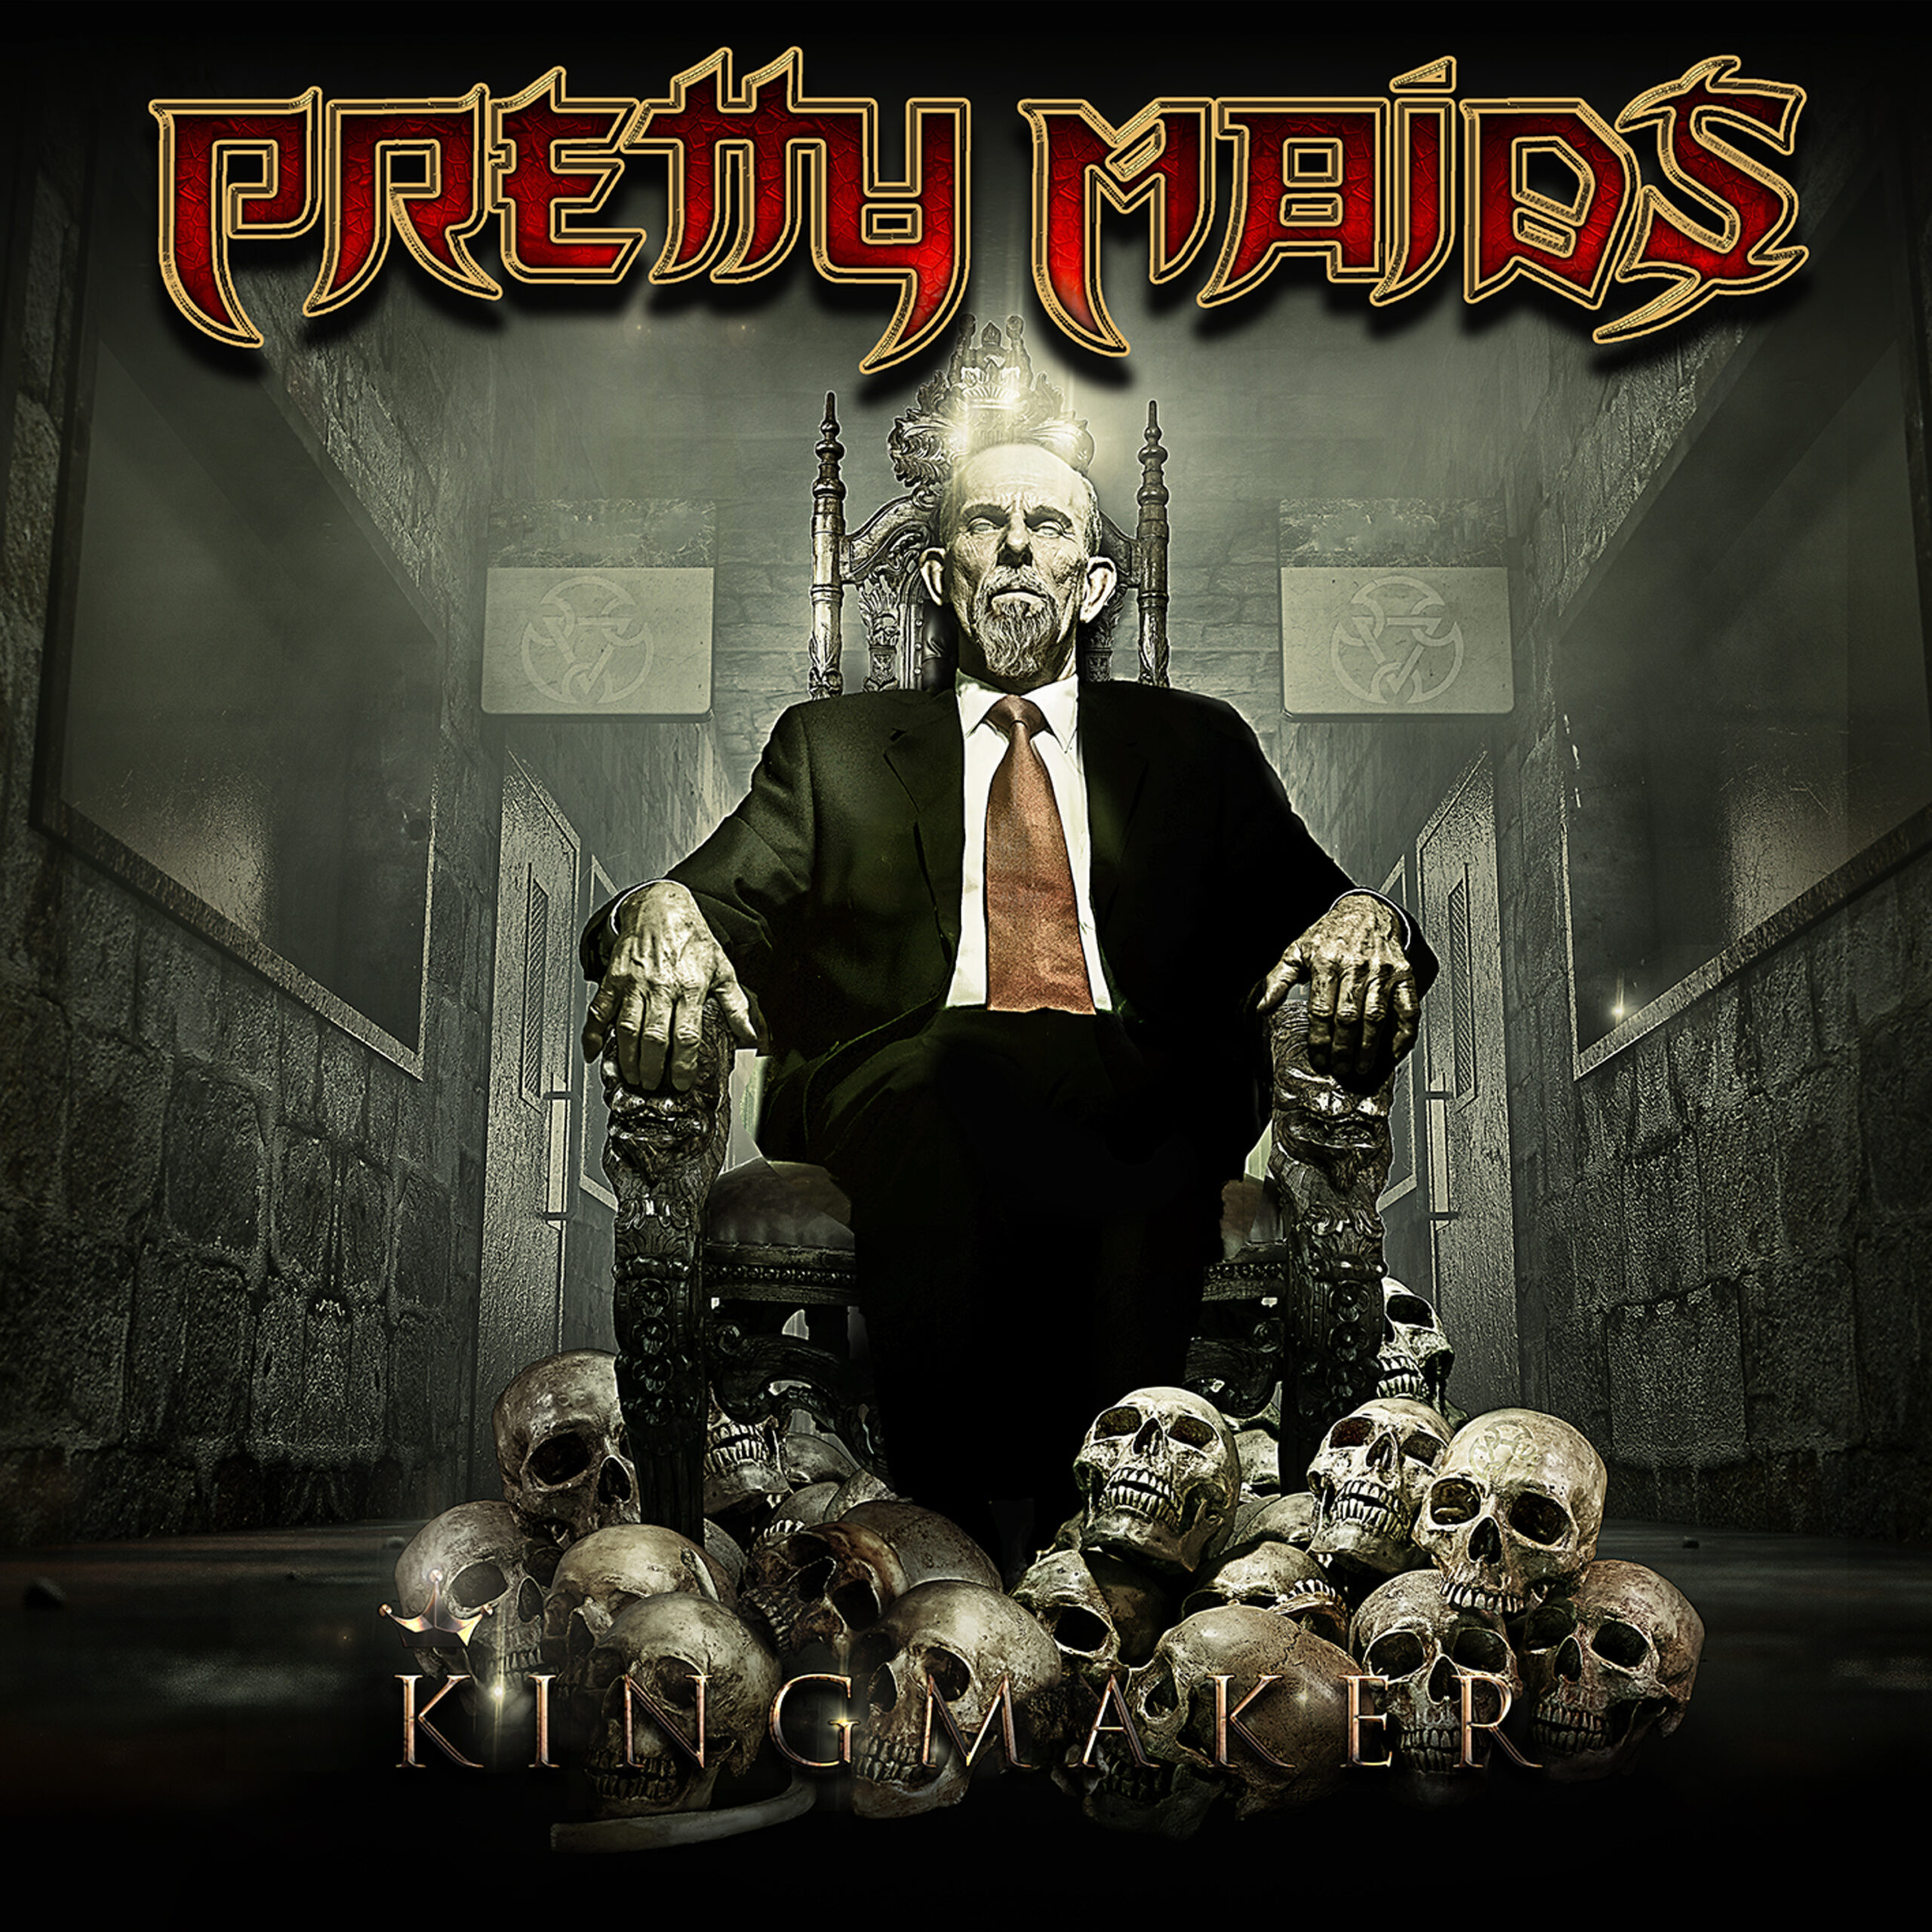 PRETTY MAIDS kingmaker COVER